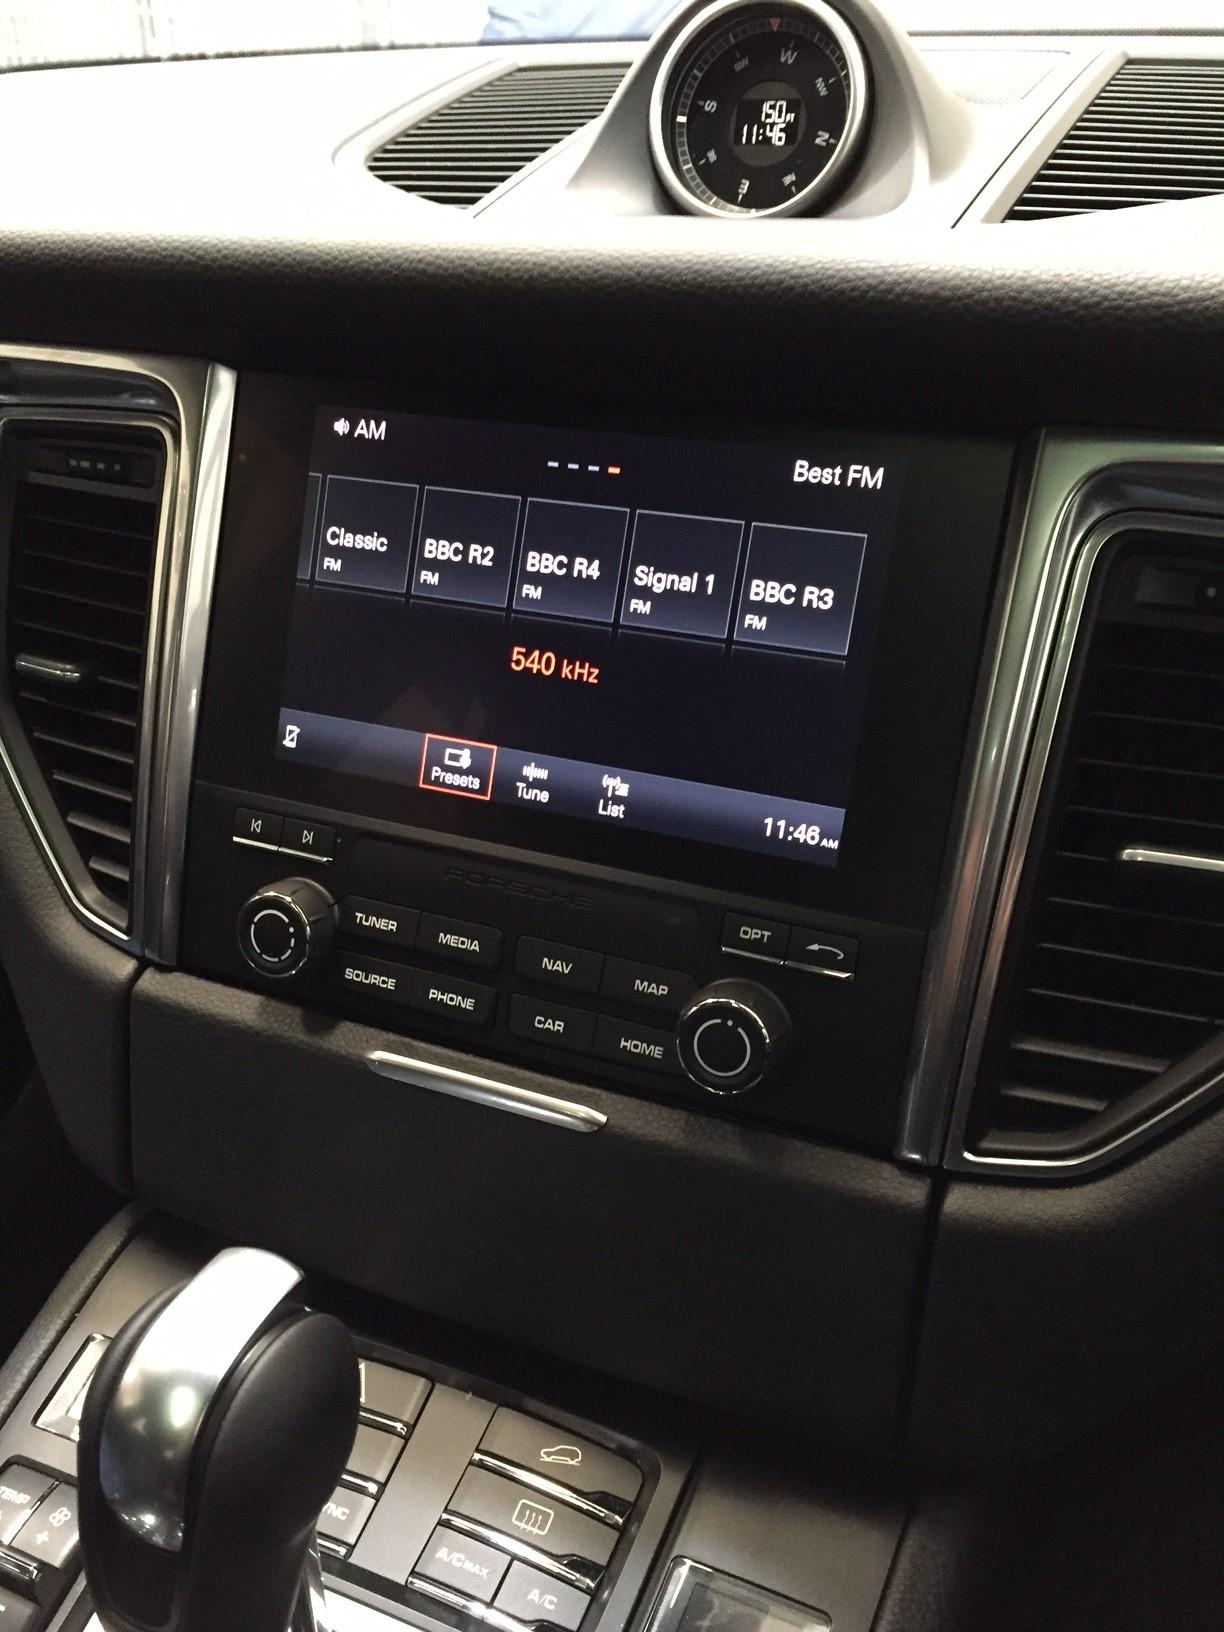 Porsche | Vehicle Integration Products | Nav TV | Reverse Camera